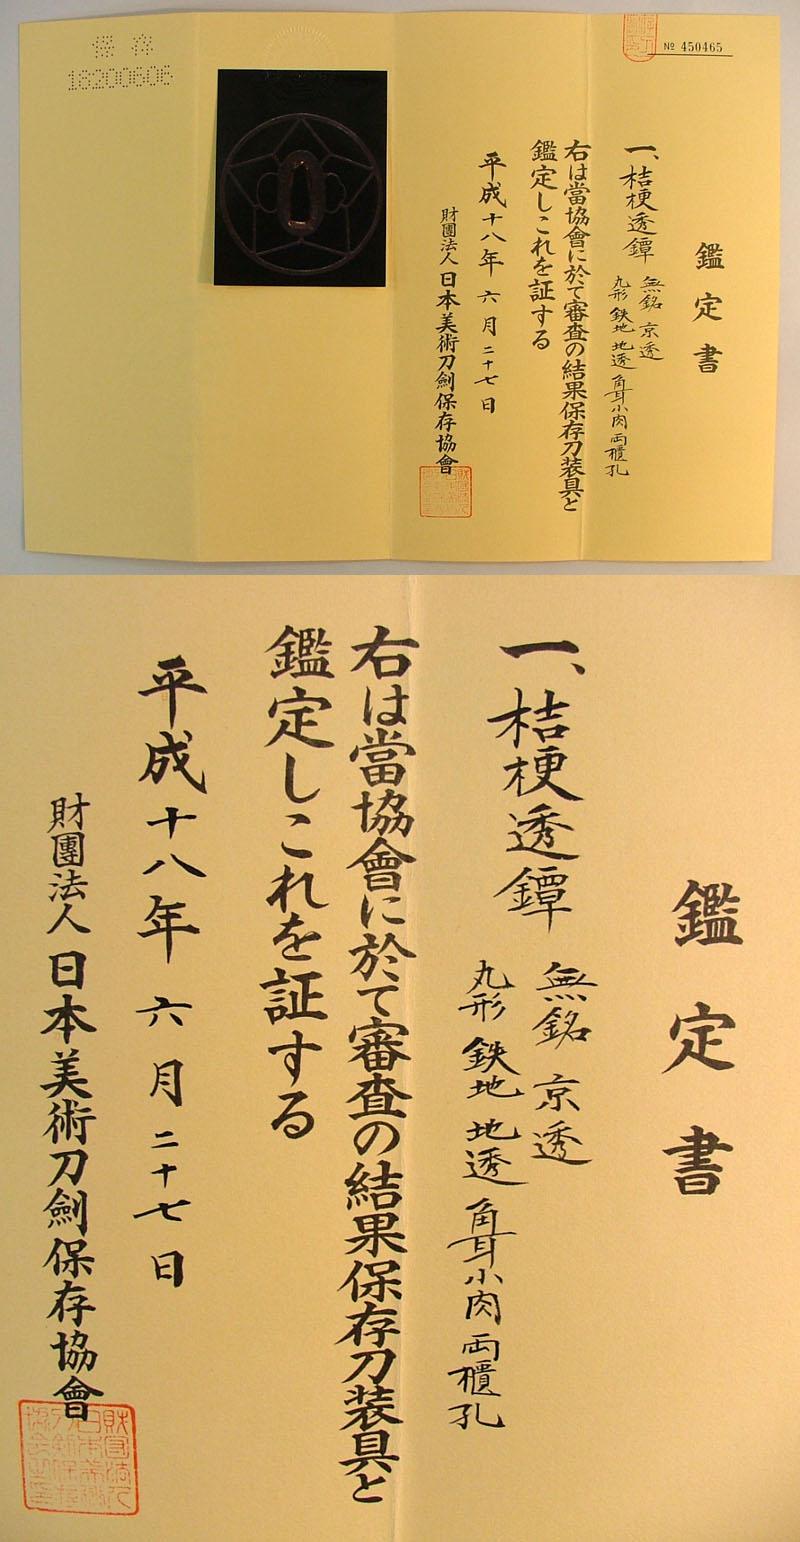 桔梗透鍔 無銘 京透 Picture of Certificate